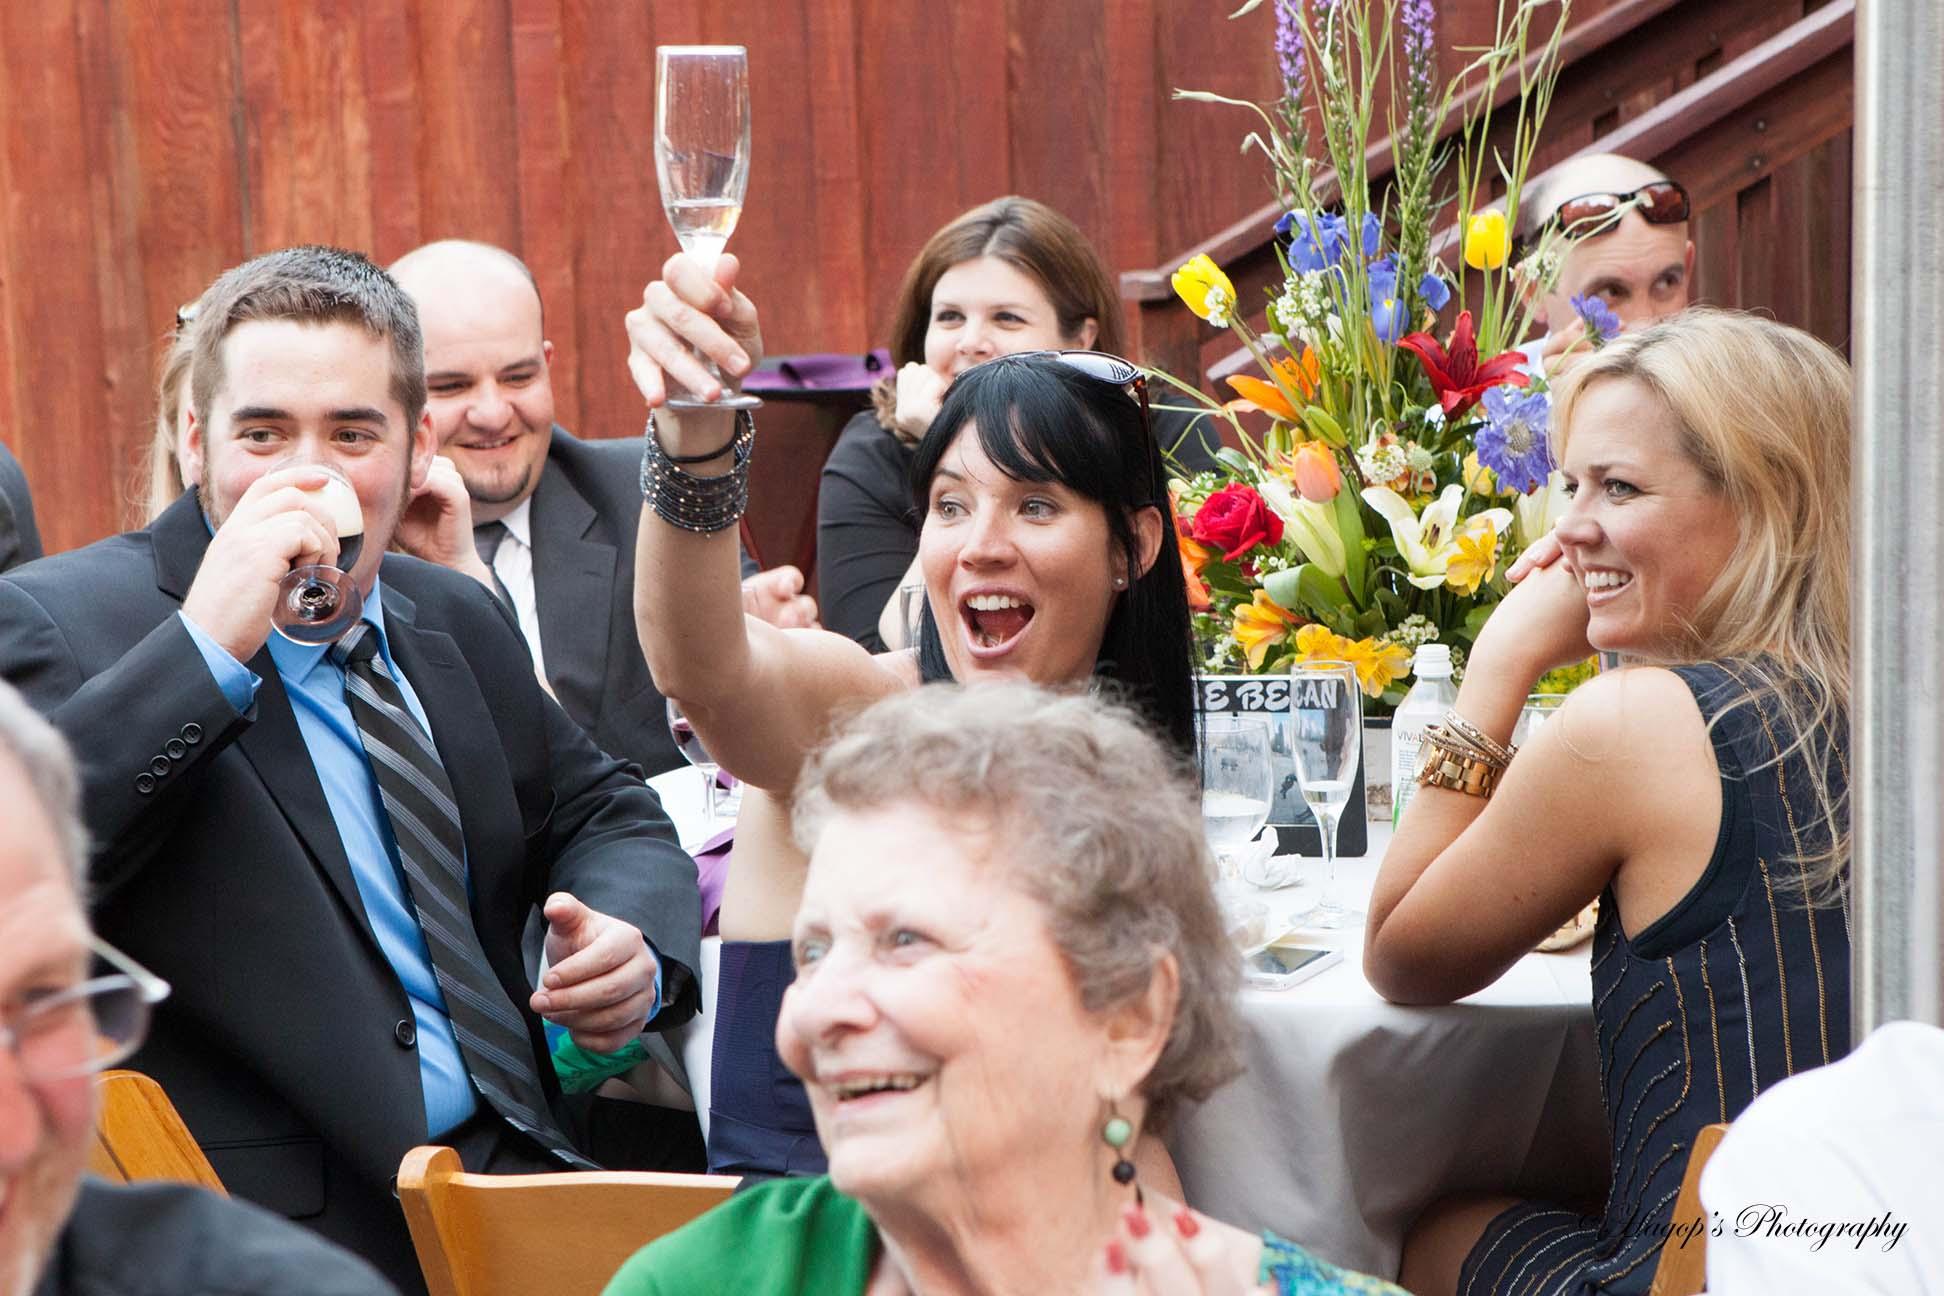 toasting candid photo